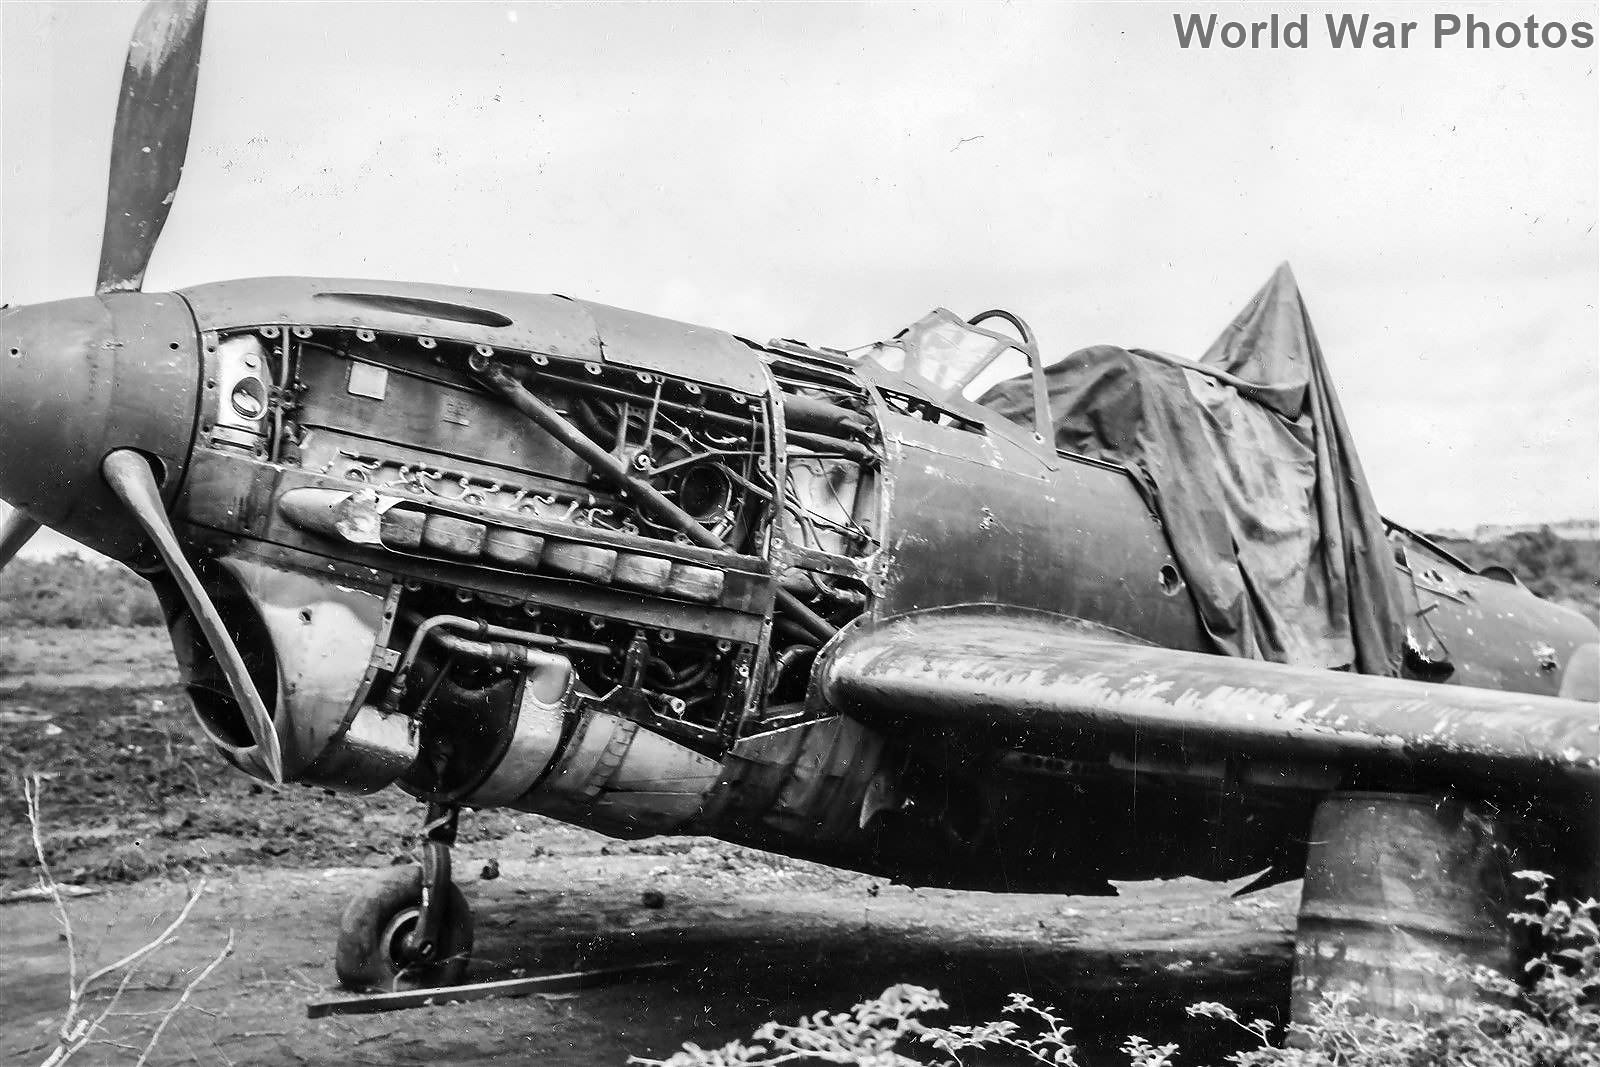 www.worldwarphotos.info/wp-content/gallery/japan/aircrafts/d4y/D4Y1_Suisei_engine_Saipan_jun44.jpg